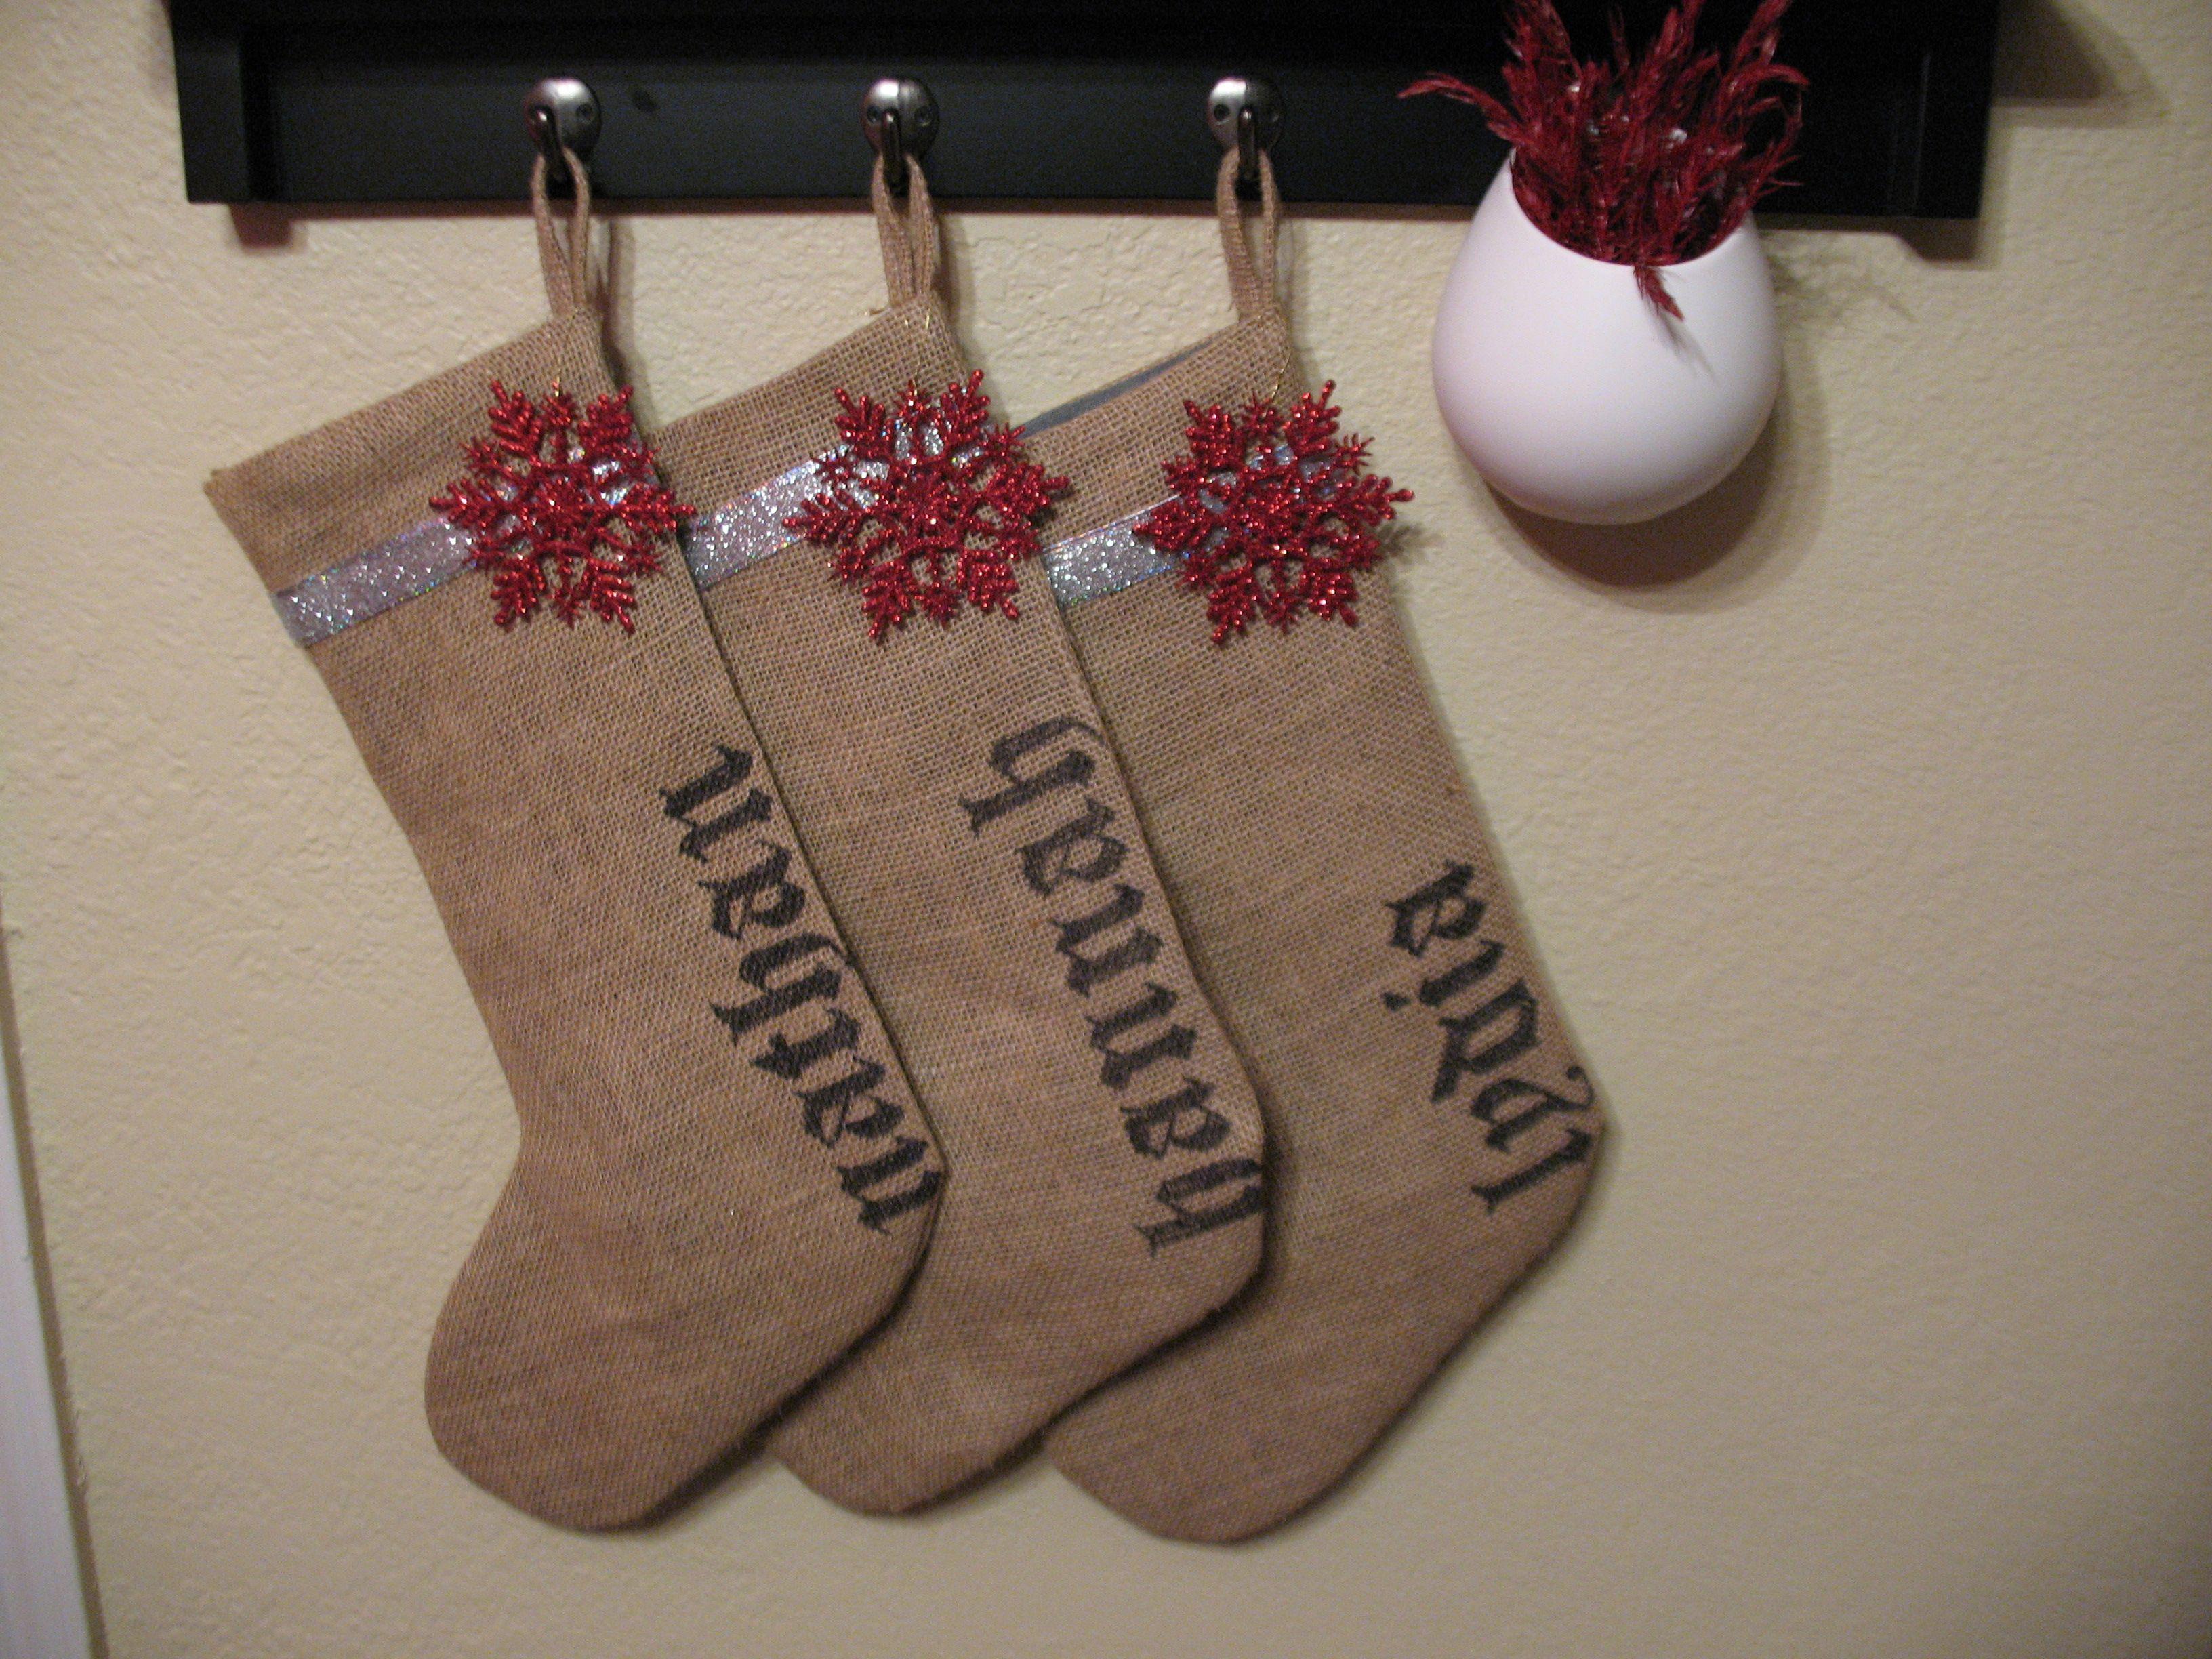 Personalized Burlap Stockings Burlap Christmas Stockings